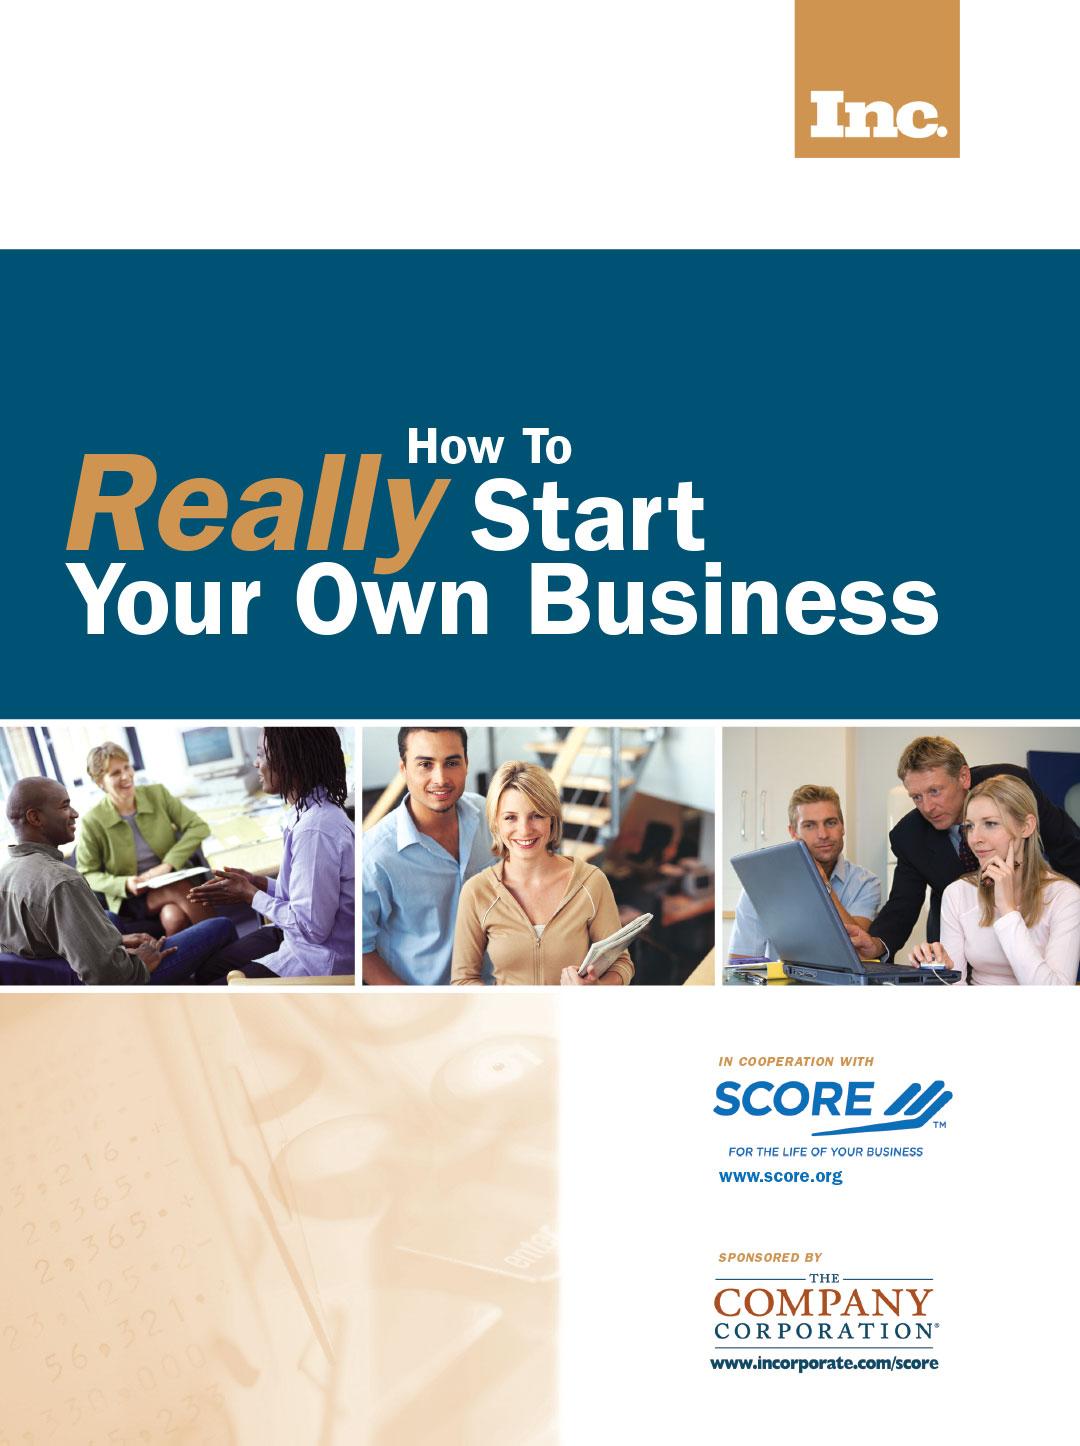 SCORE-Really-Start-Business-2013-(002)-1